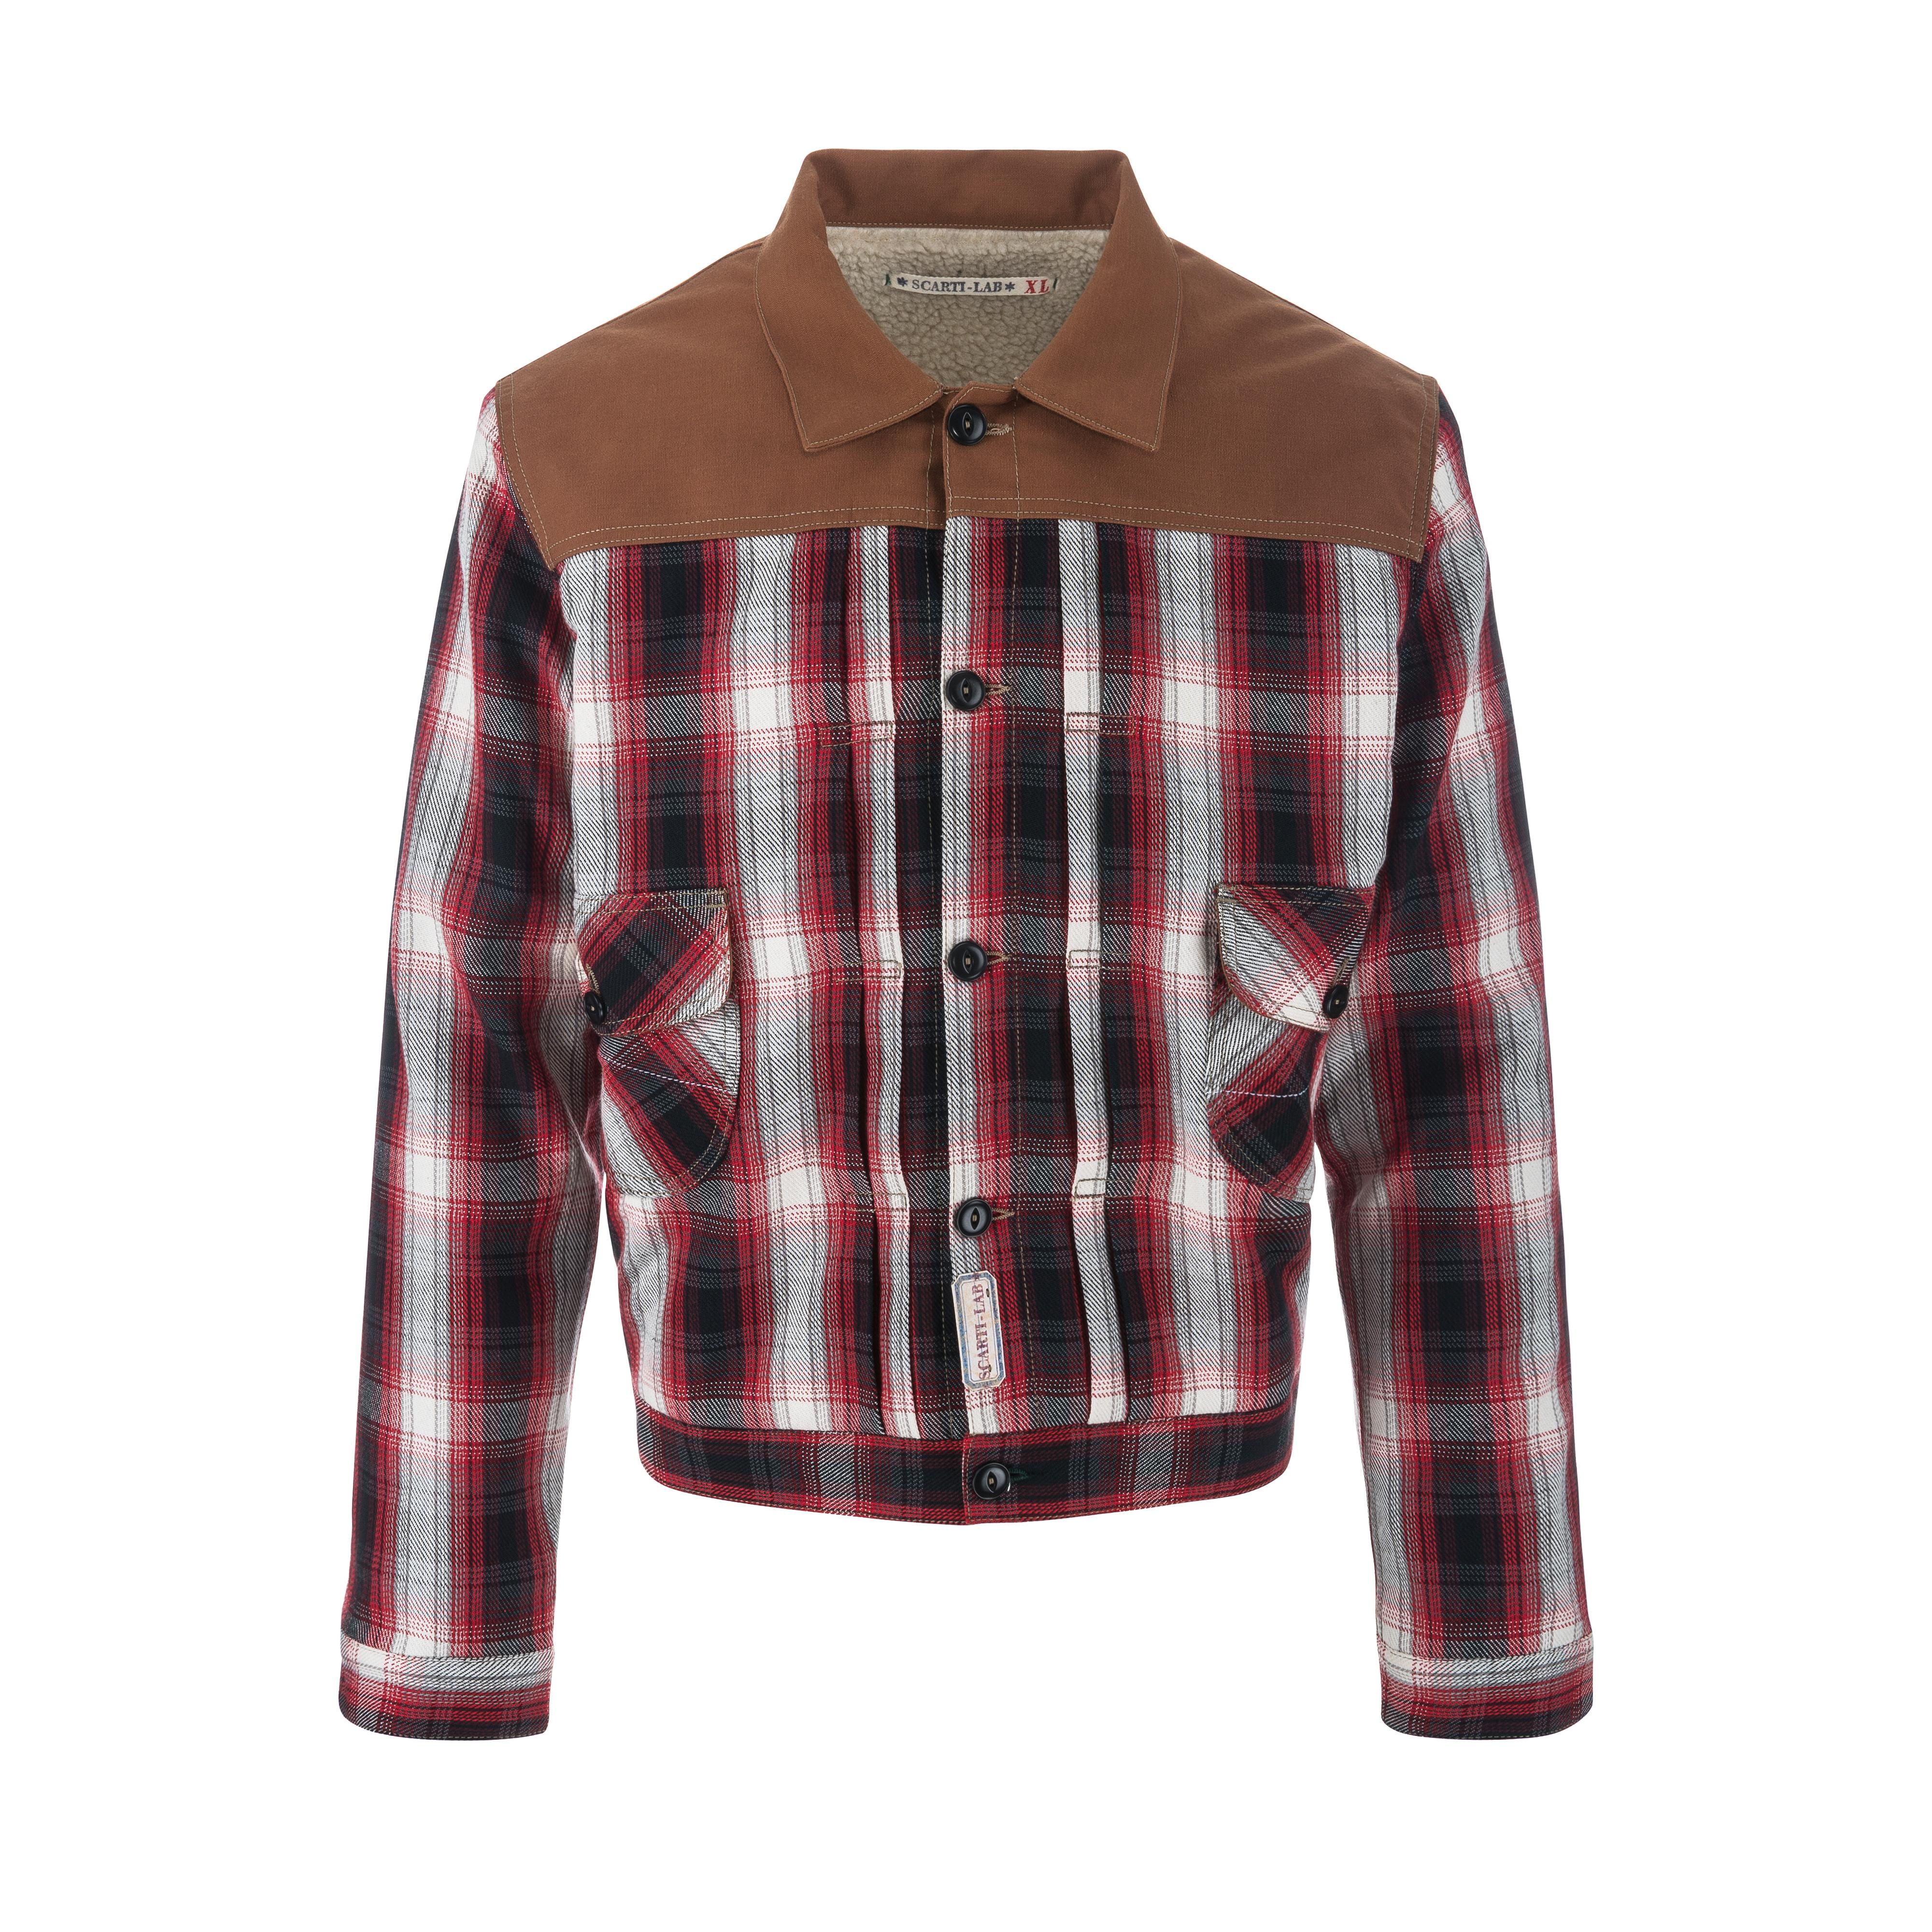 Cotton Jacket Brown/Check Black/Red/White